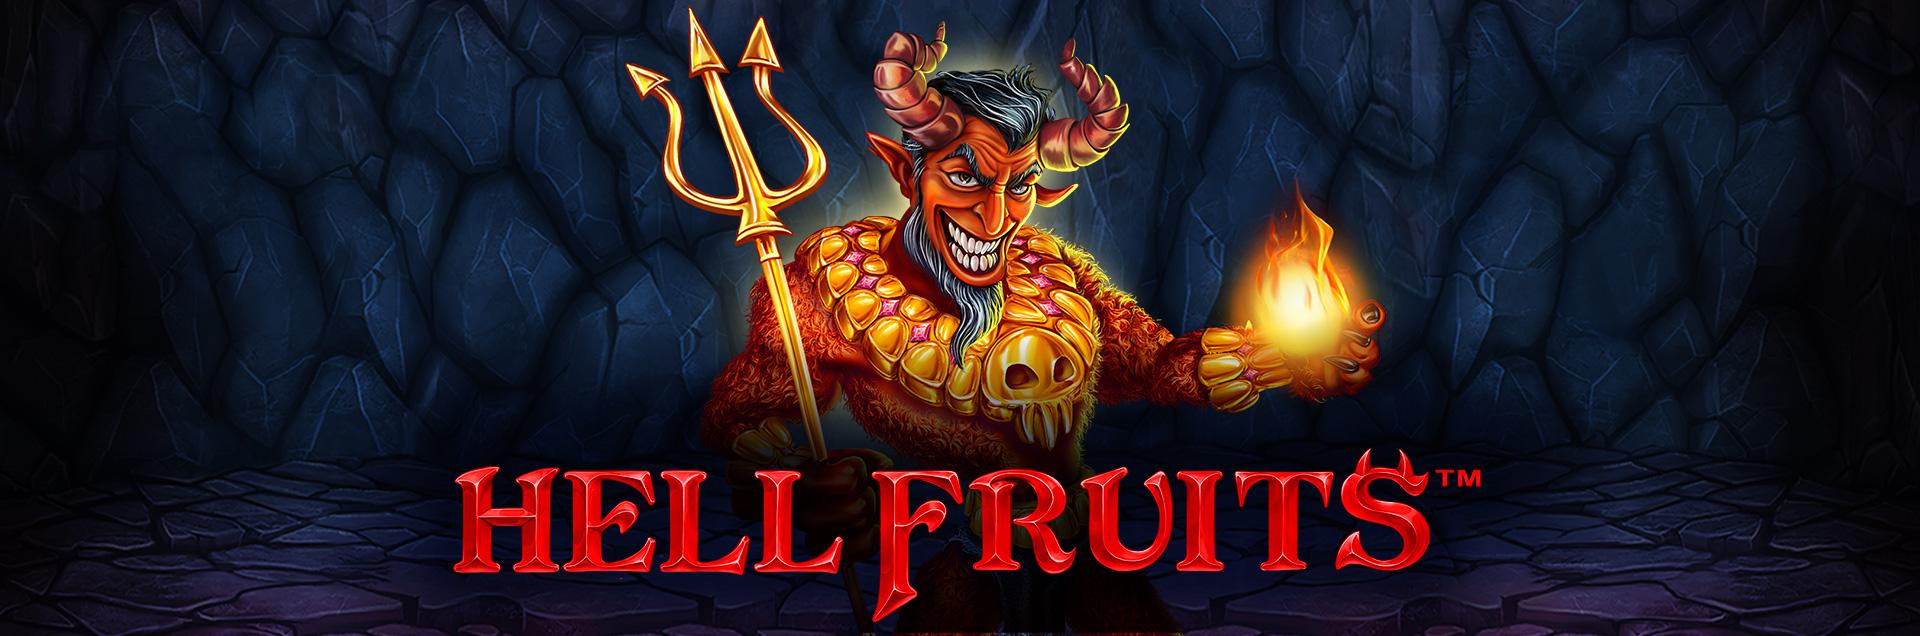 Hell Fruits header games